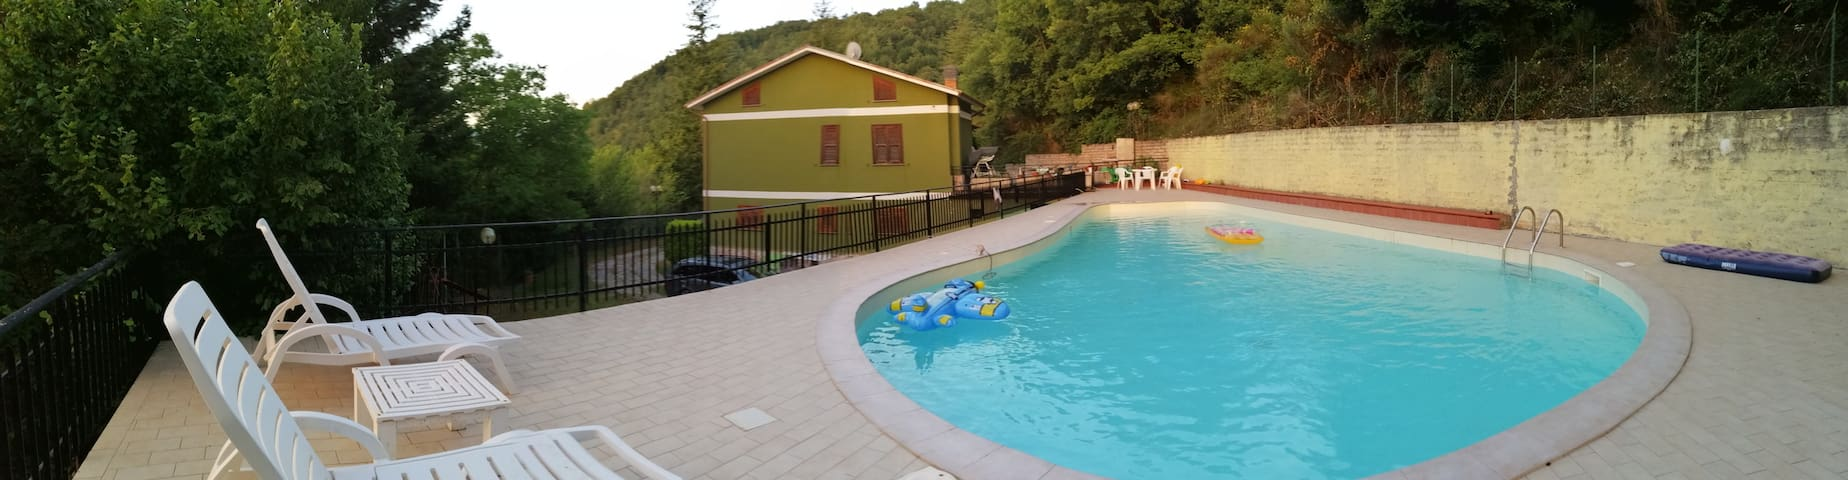 Villa con piscina a uso esclusivo